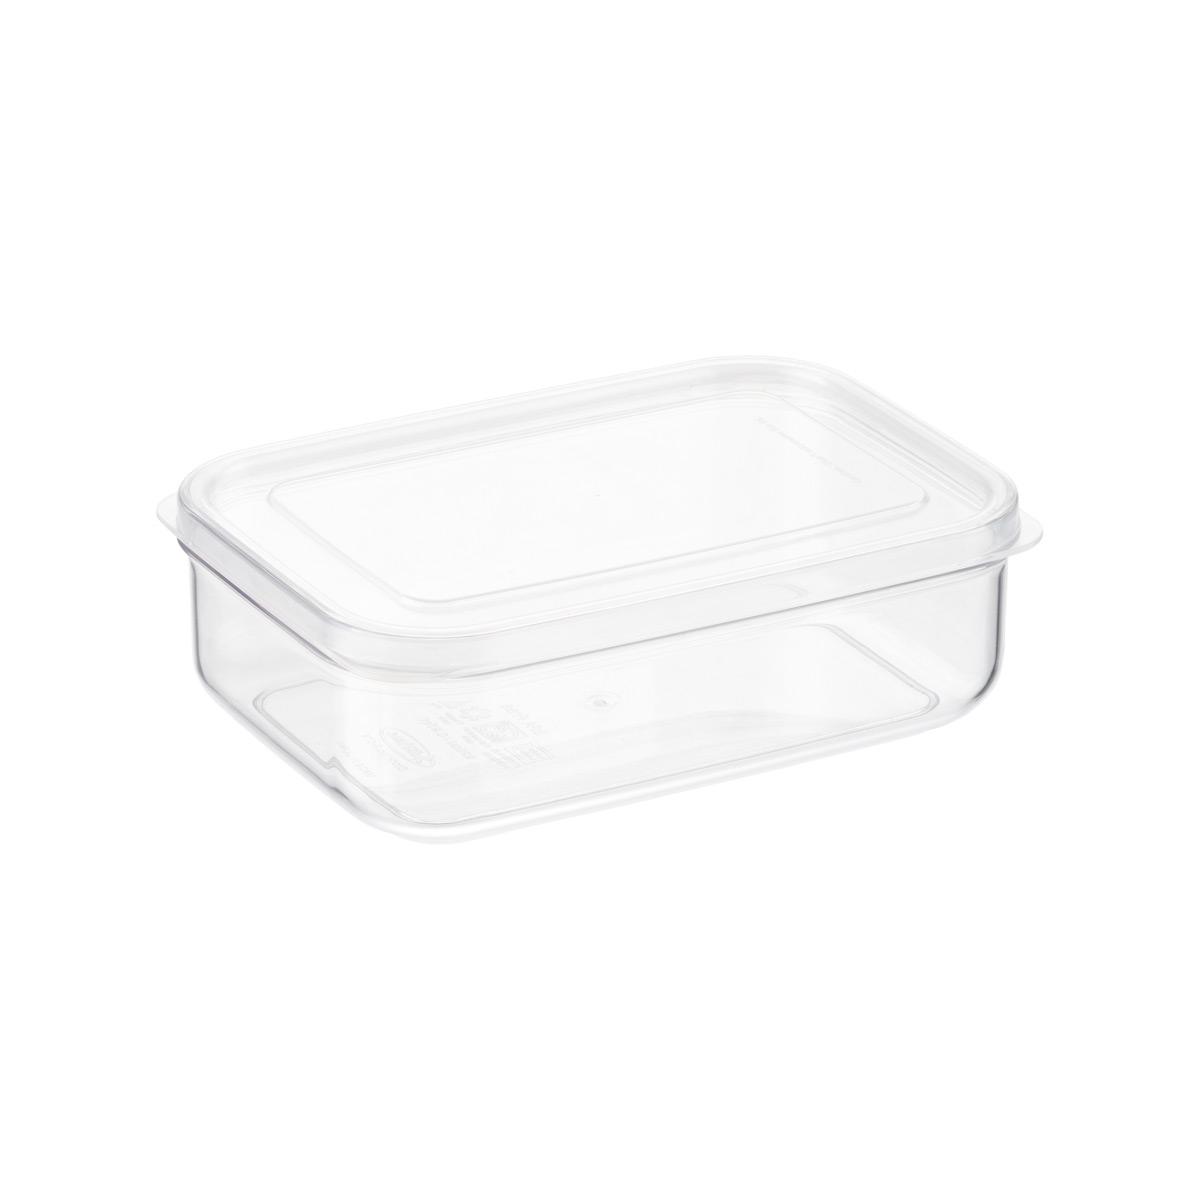 Crystal Clear Rectangular Food Storage